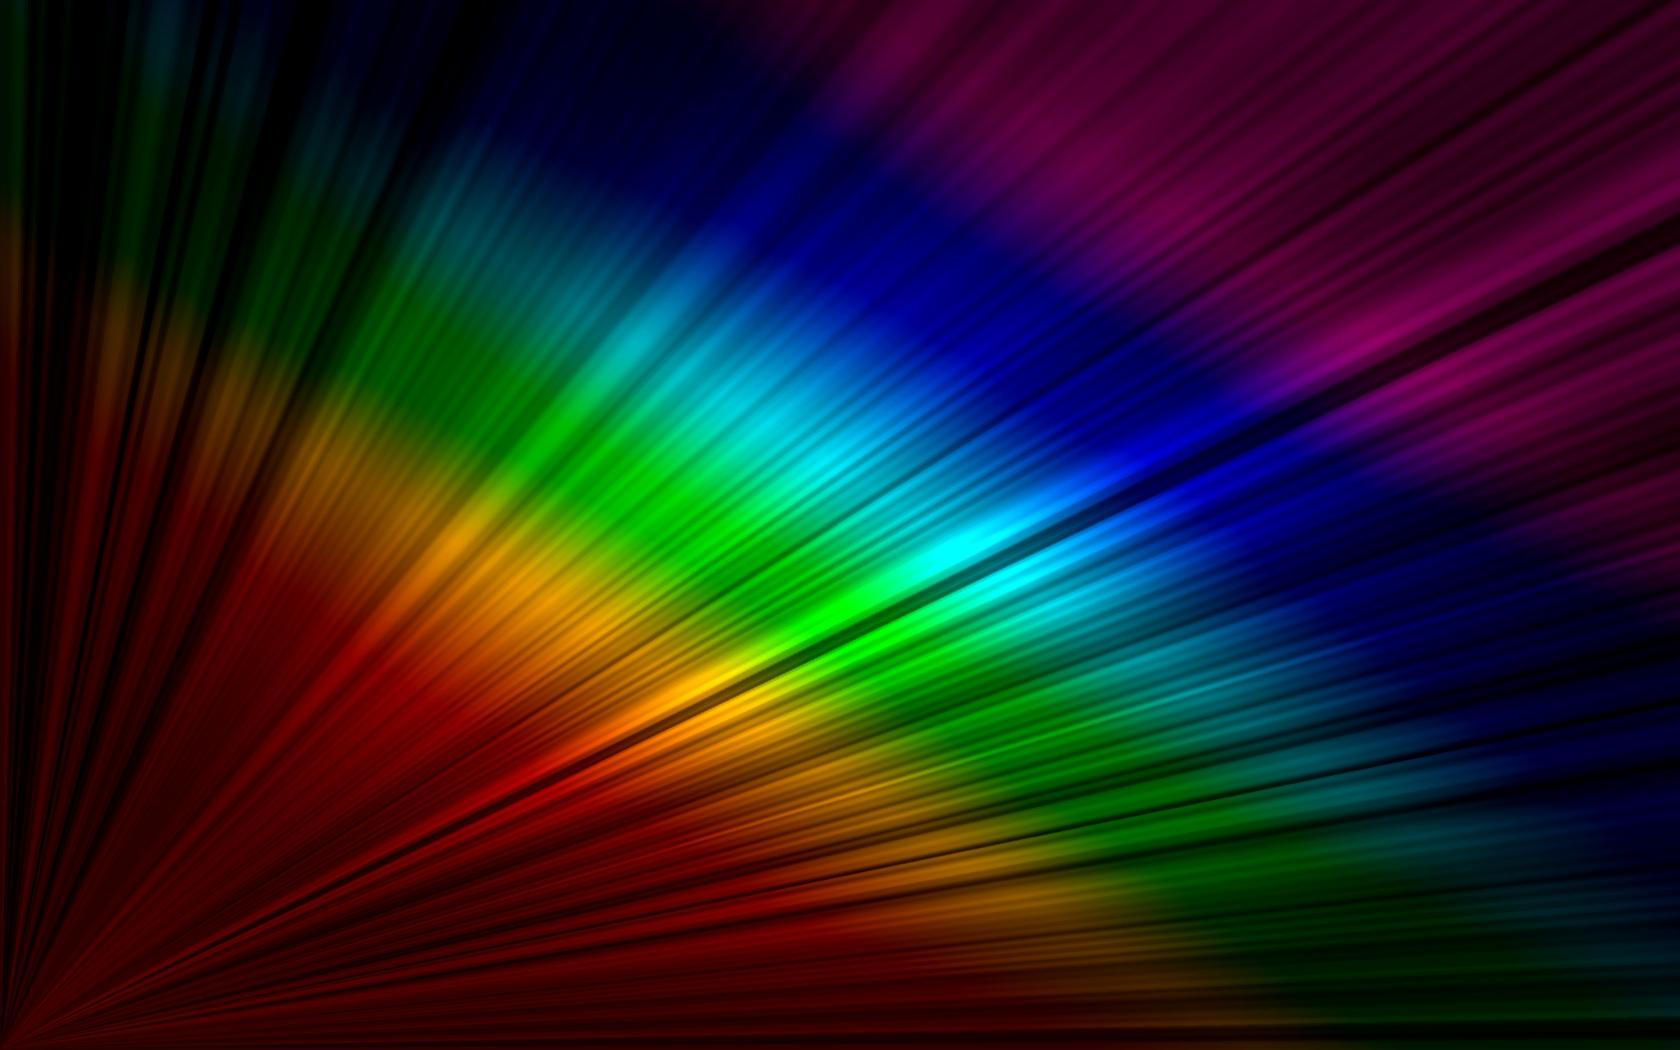 Hd wallpaper rainbow - Rainbow On The Desktop Hd Wallpaper